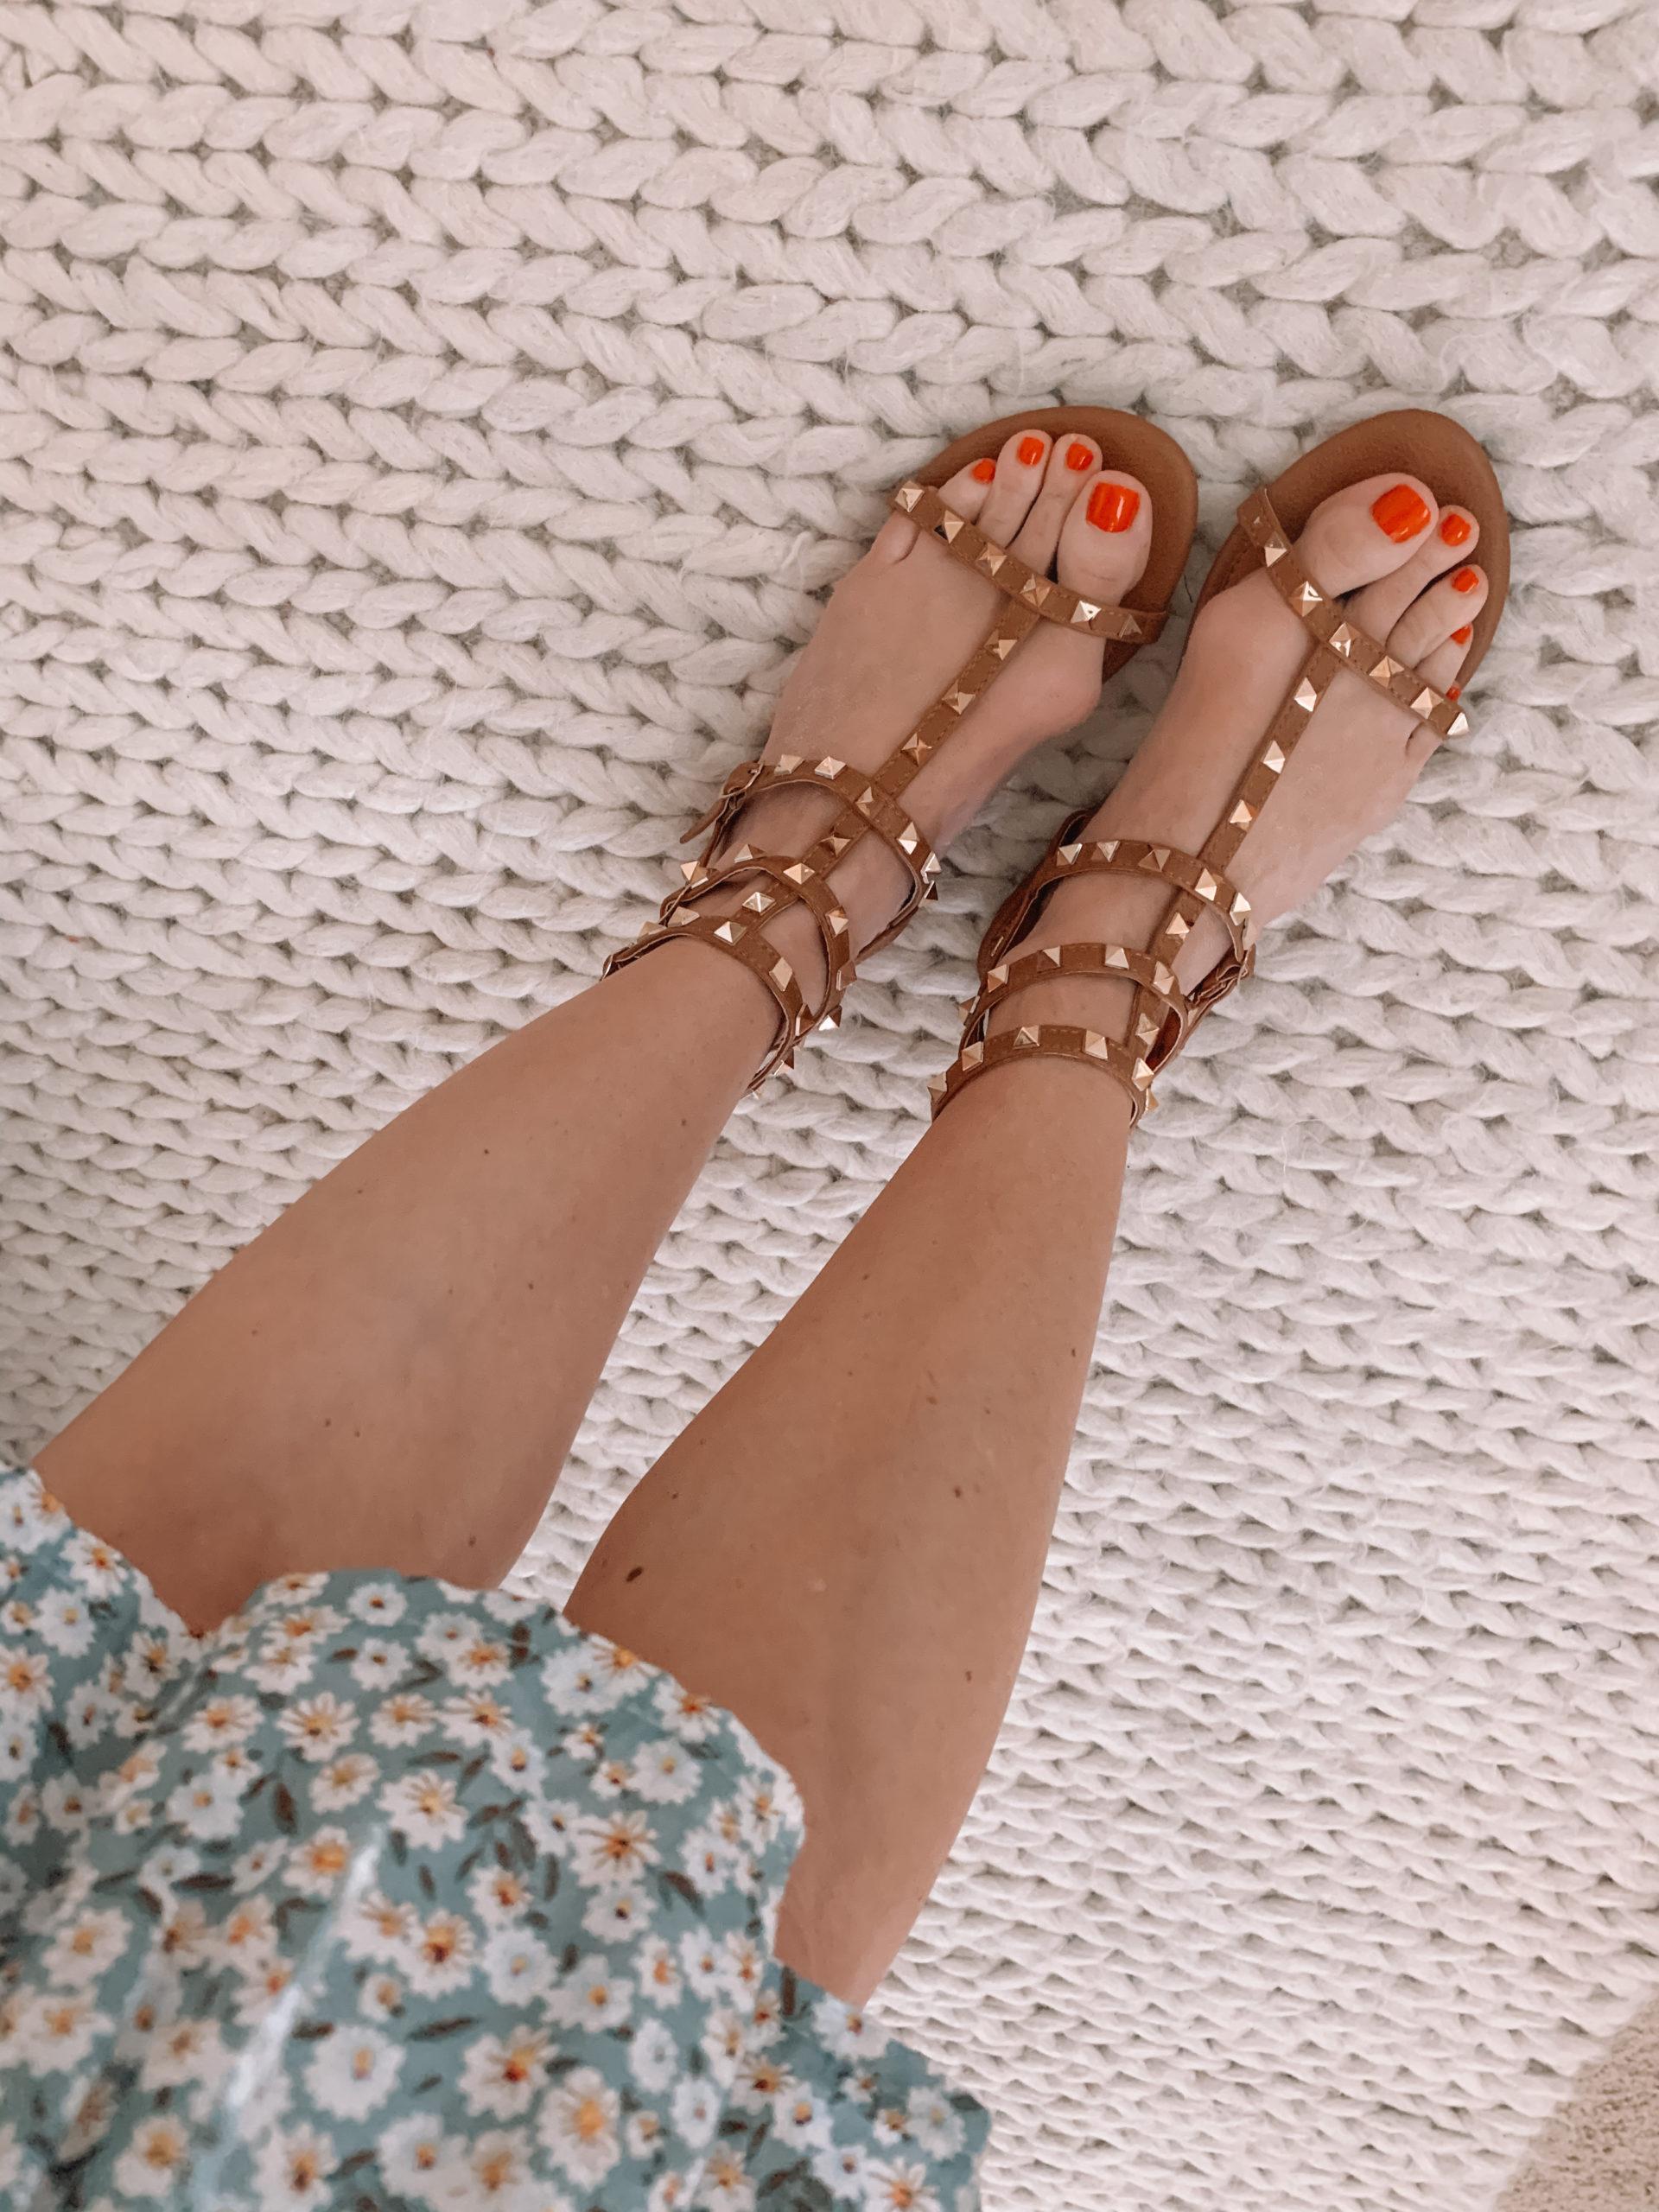 Amazon Fashion - Brown Studded Sandals